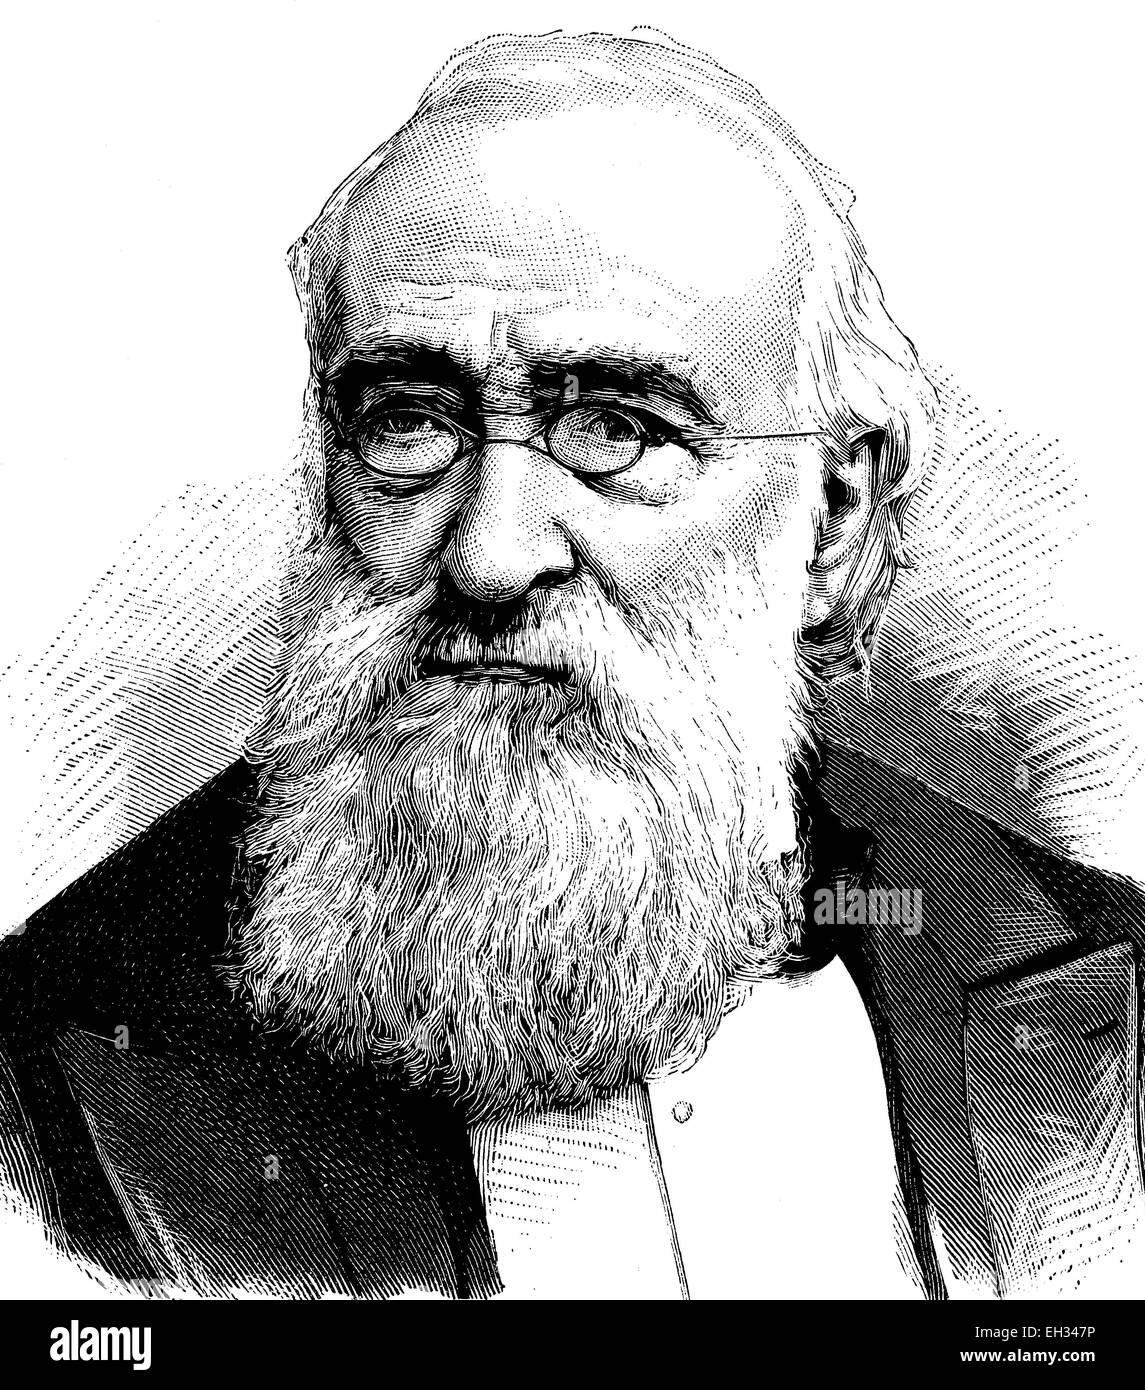 Agostino Depretis, 1813 - 1887, Italian statesman, woodcut 1888 - Stock Image